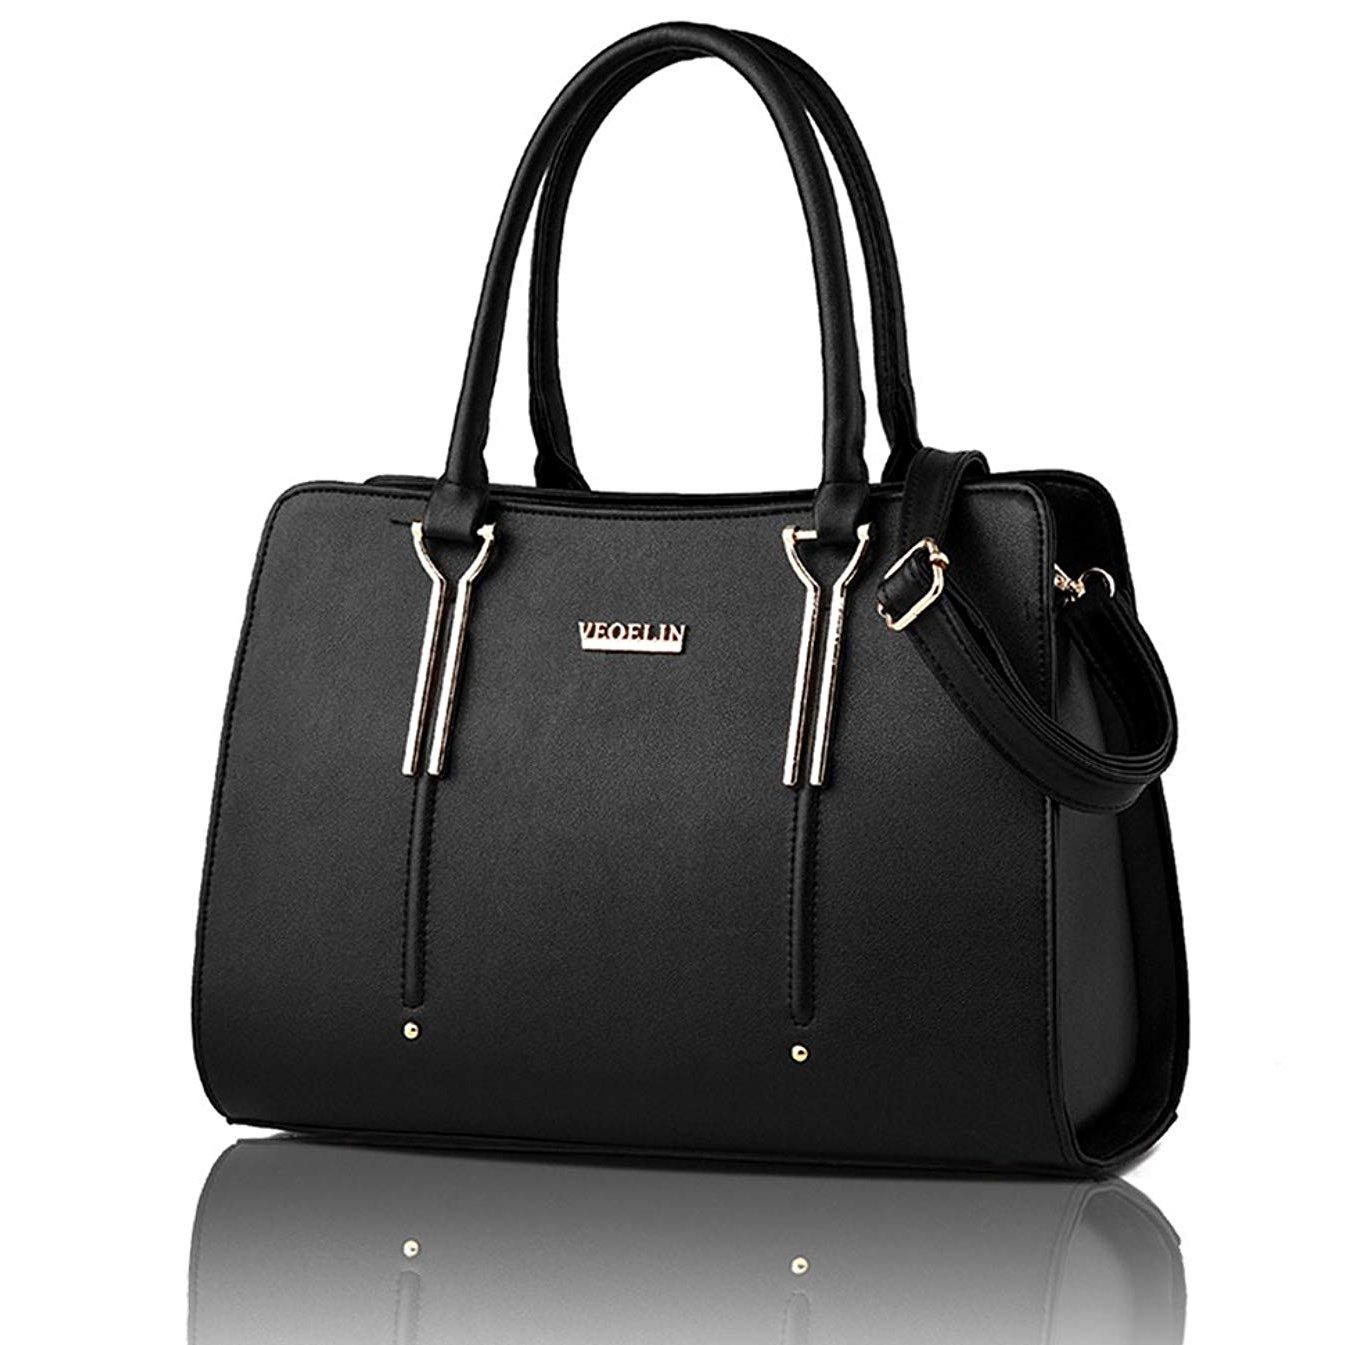 Satchel Purse for Women Satchel Tote Bag Womens Purses and Handbag Shoulder Bag (black)